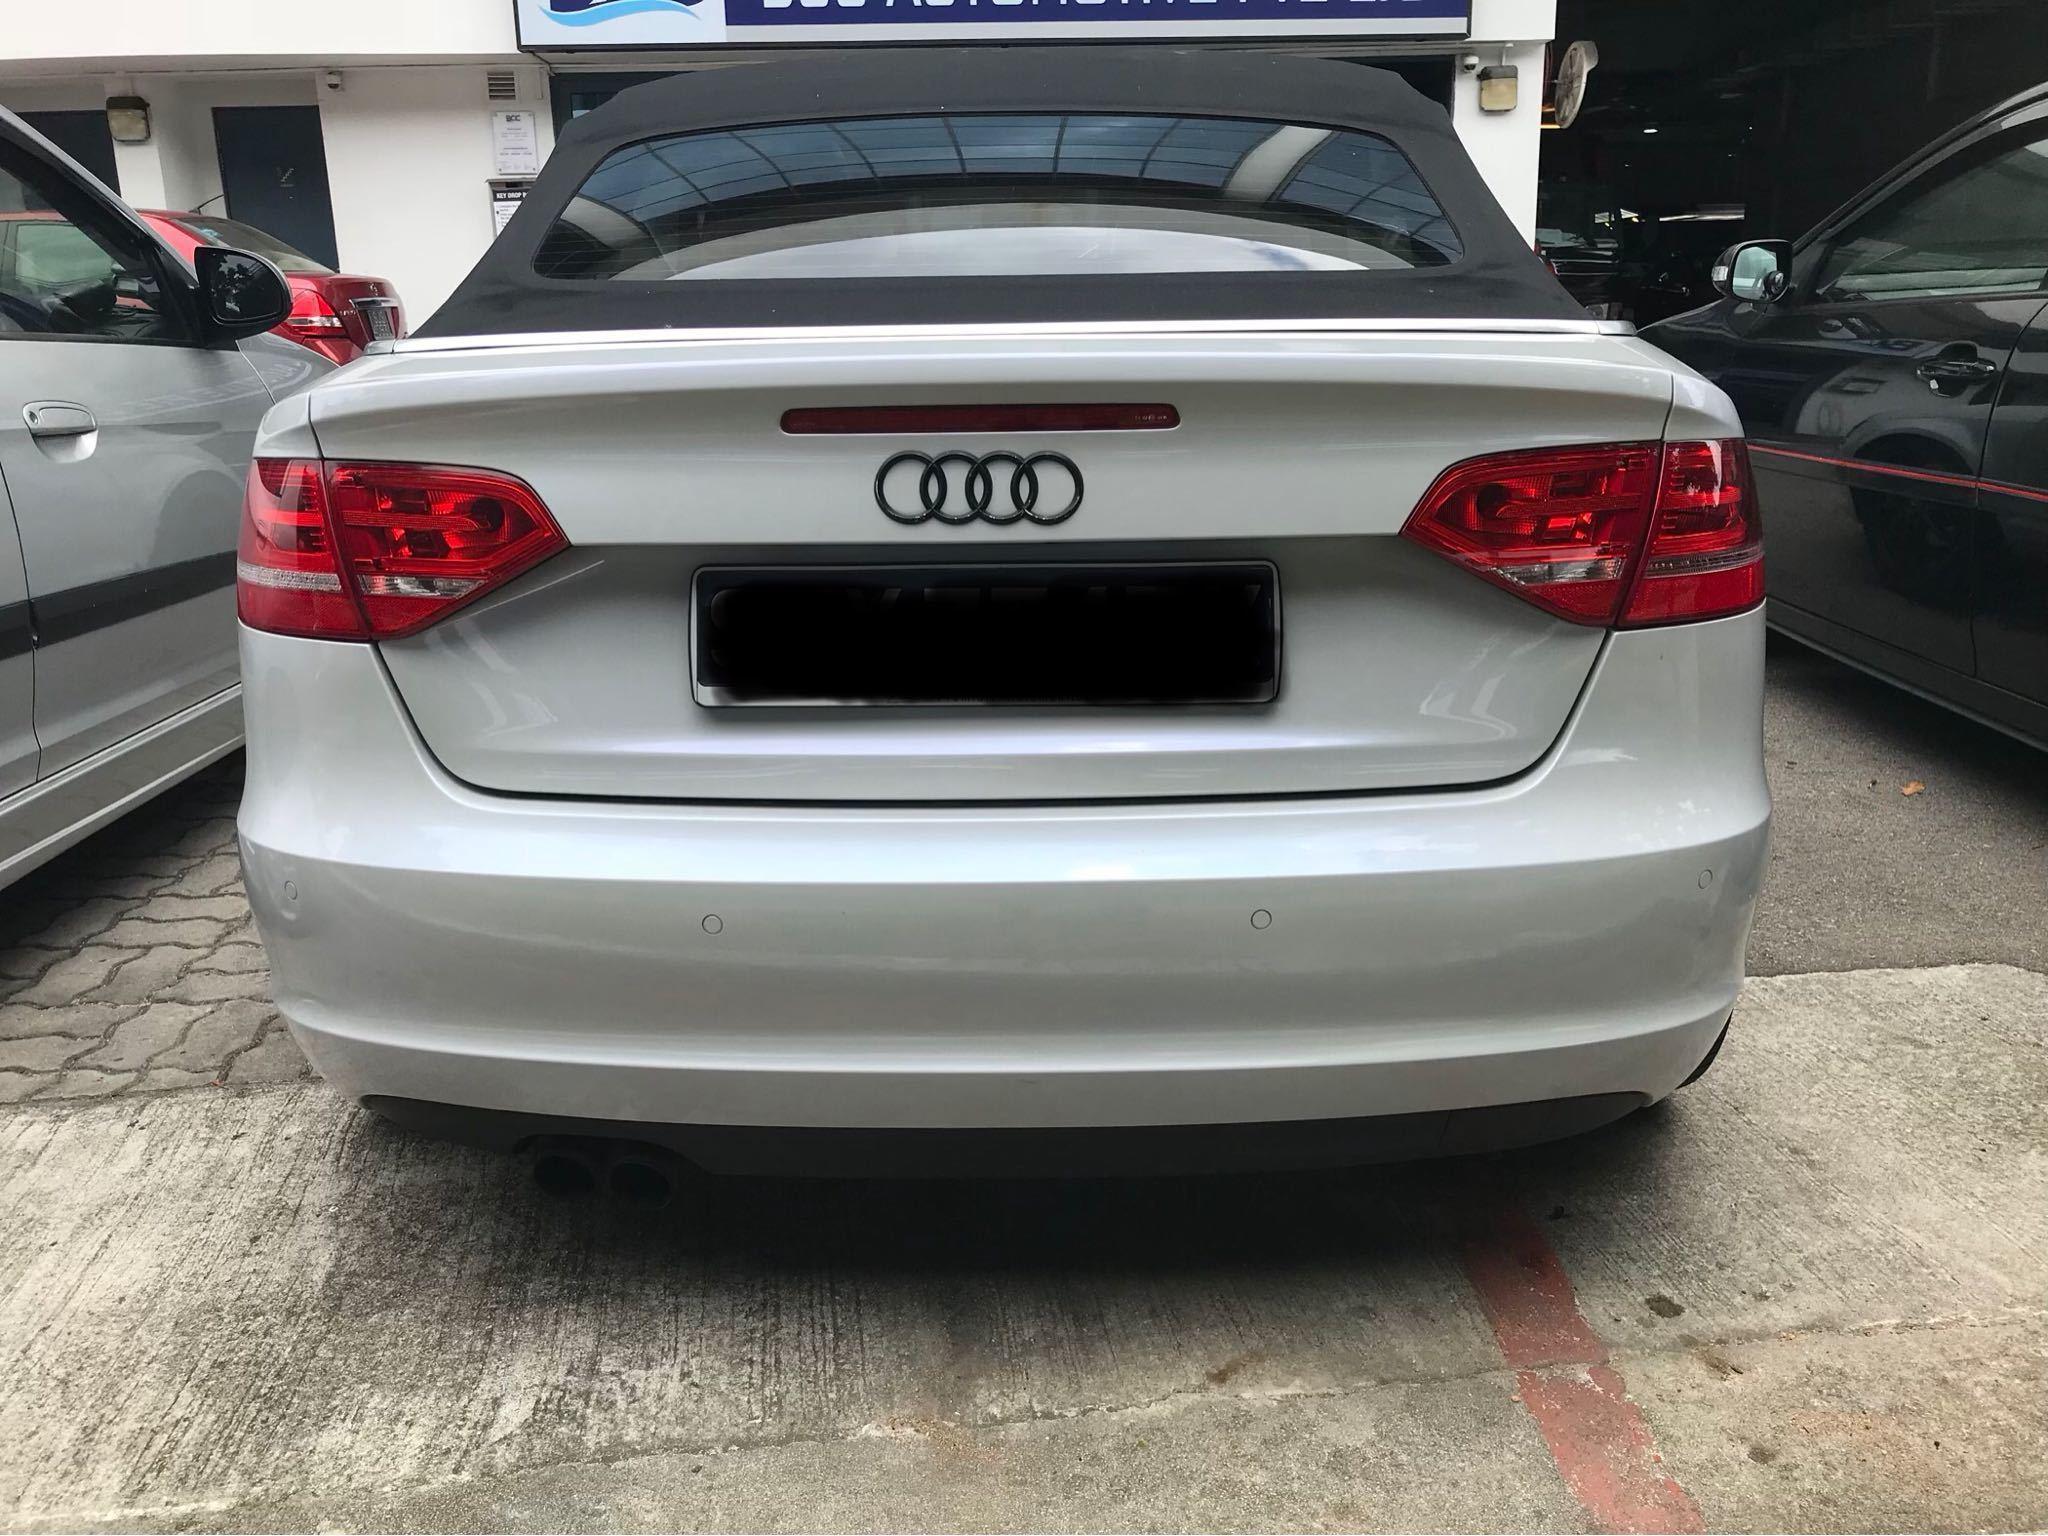 Audi A3 Cabriolet 1.8 Auto TFSI S-tronic